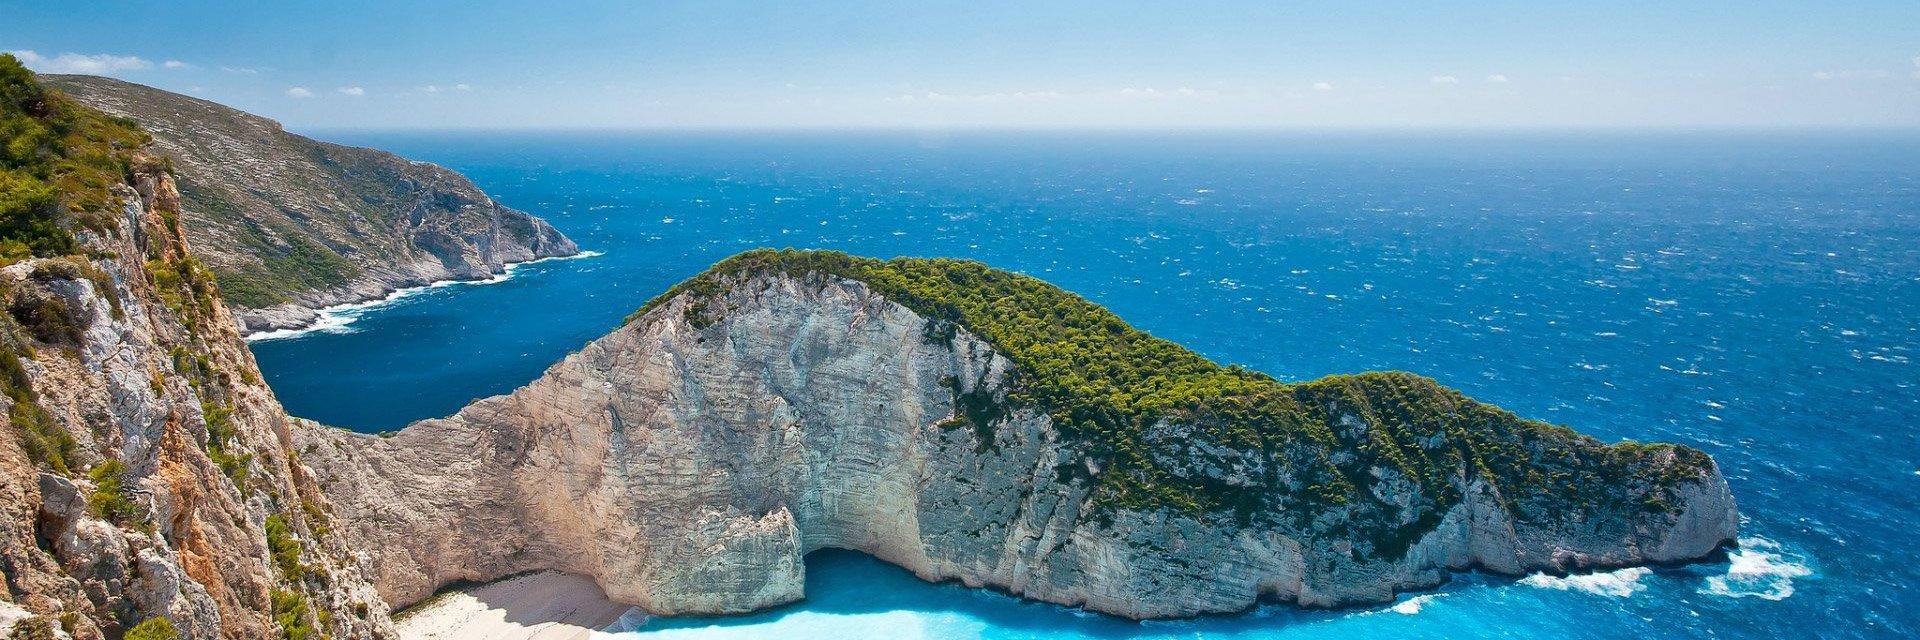 Туры на курорт Дуррес (Албания) на 3 дня / 2 ночи 2020 из Москвы - цены, путевки на отдых на курорте Дуррес на три дня - ПАКС